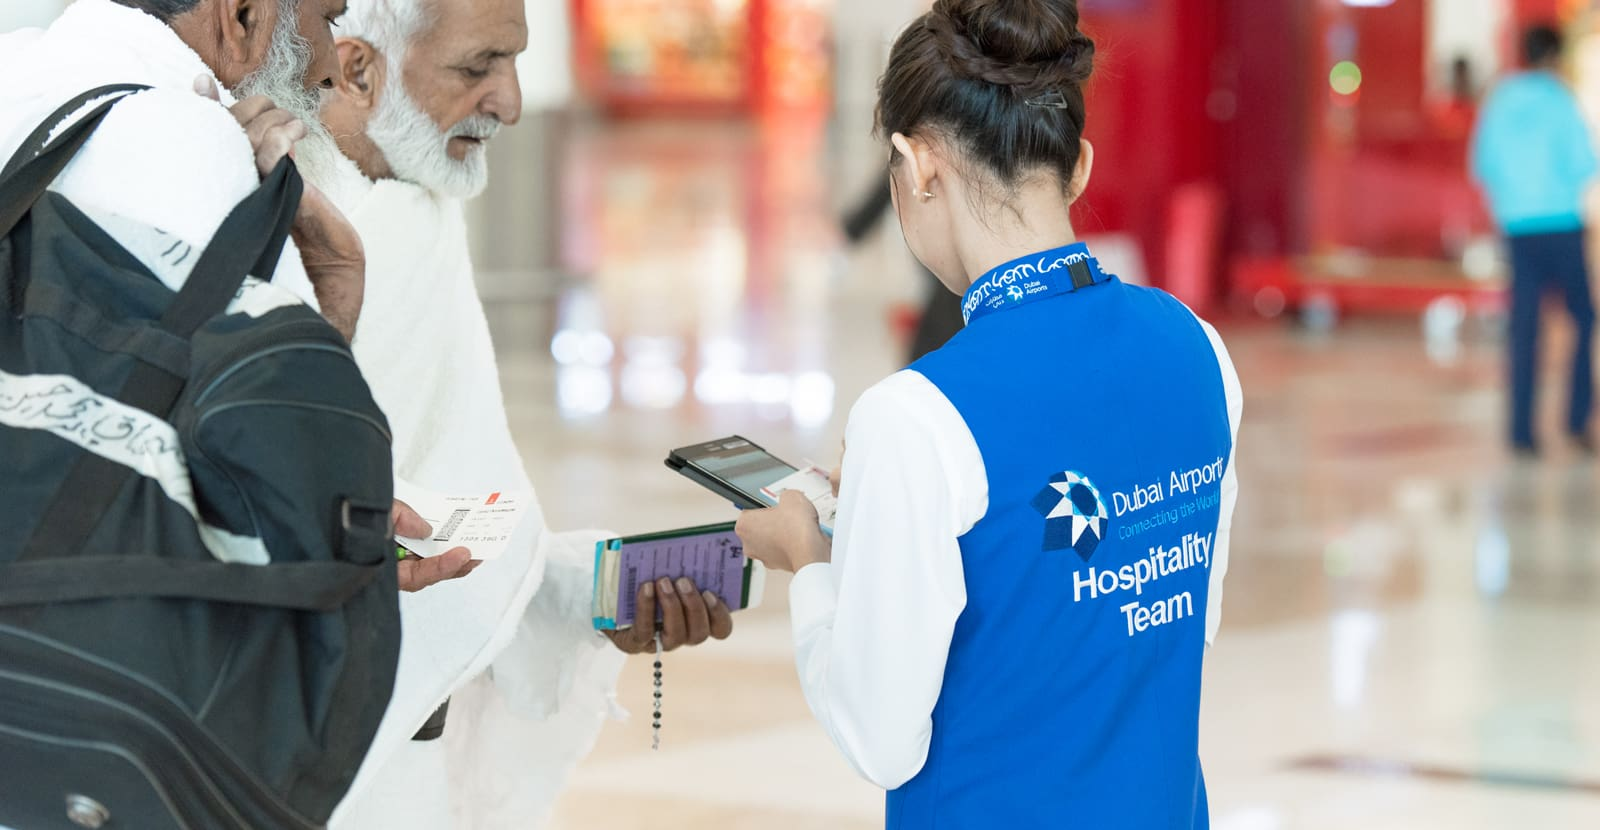 dubai-airports-hospitality-customer-experience-pilot-by-engine